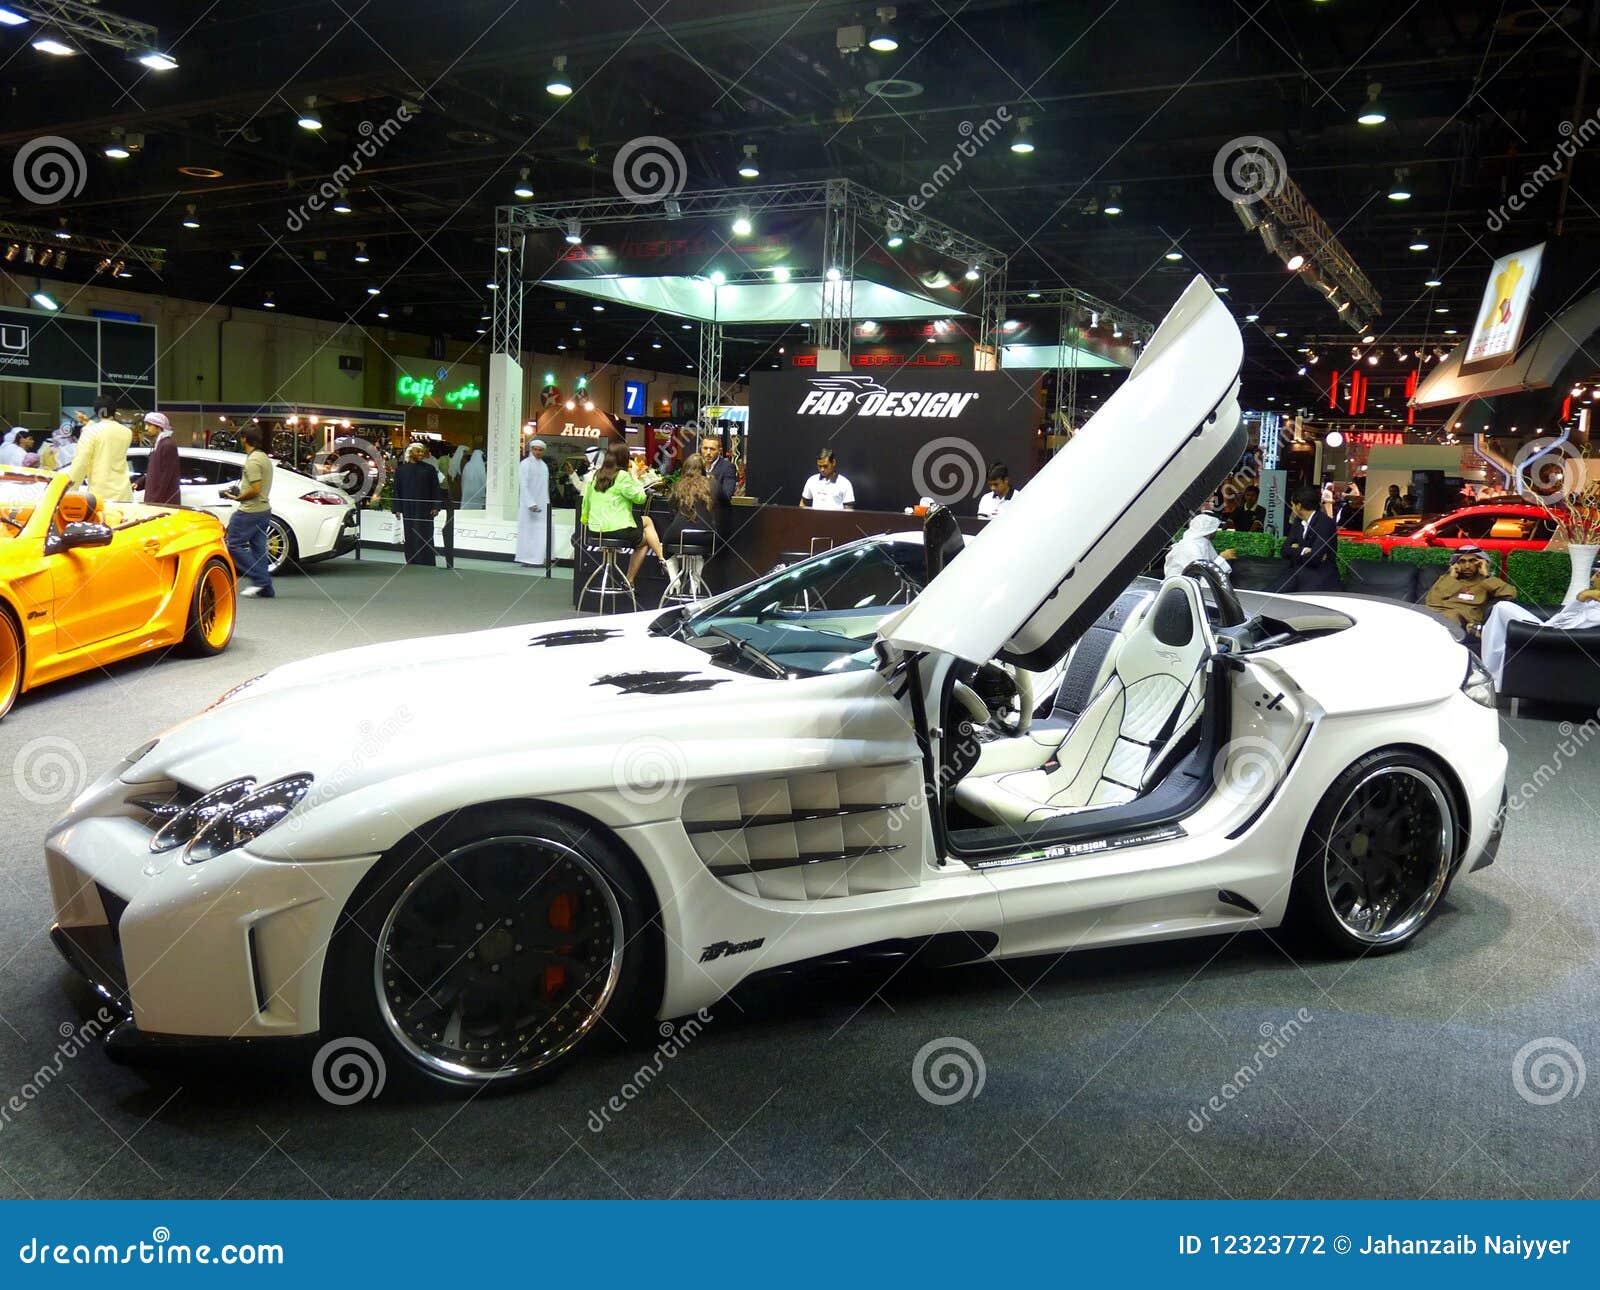 Mercedes benz luxury car editorial photography image of for Mercedes benz luxury car